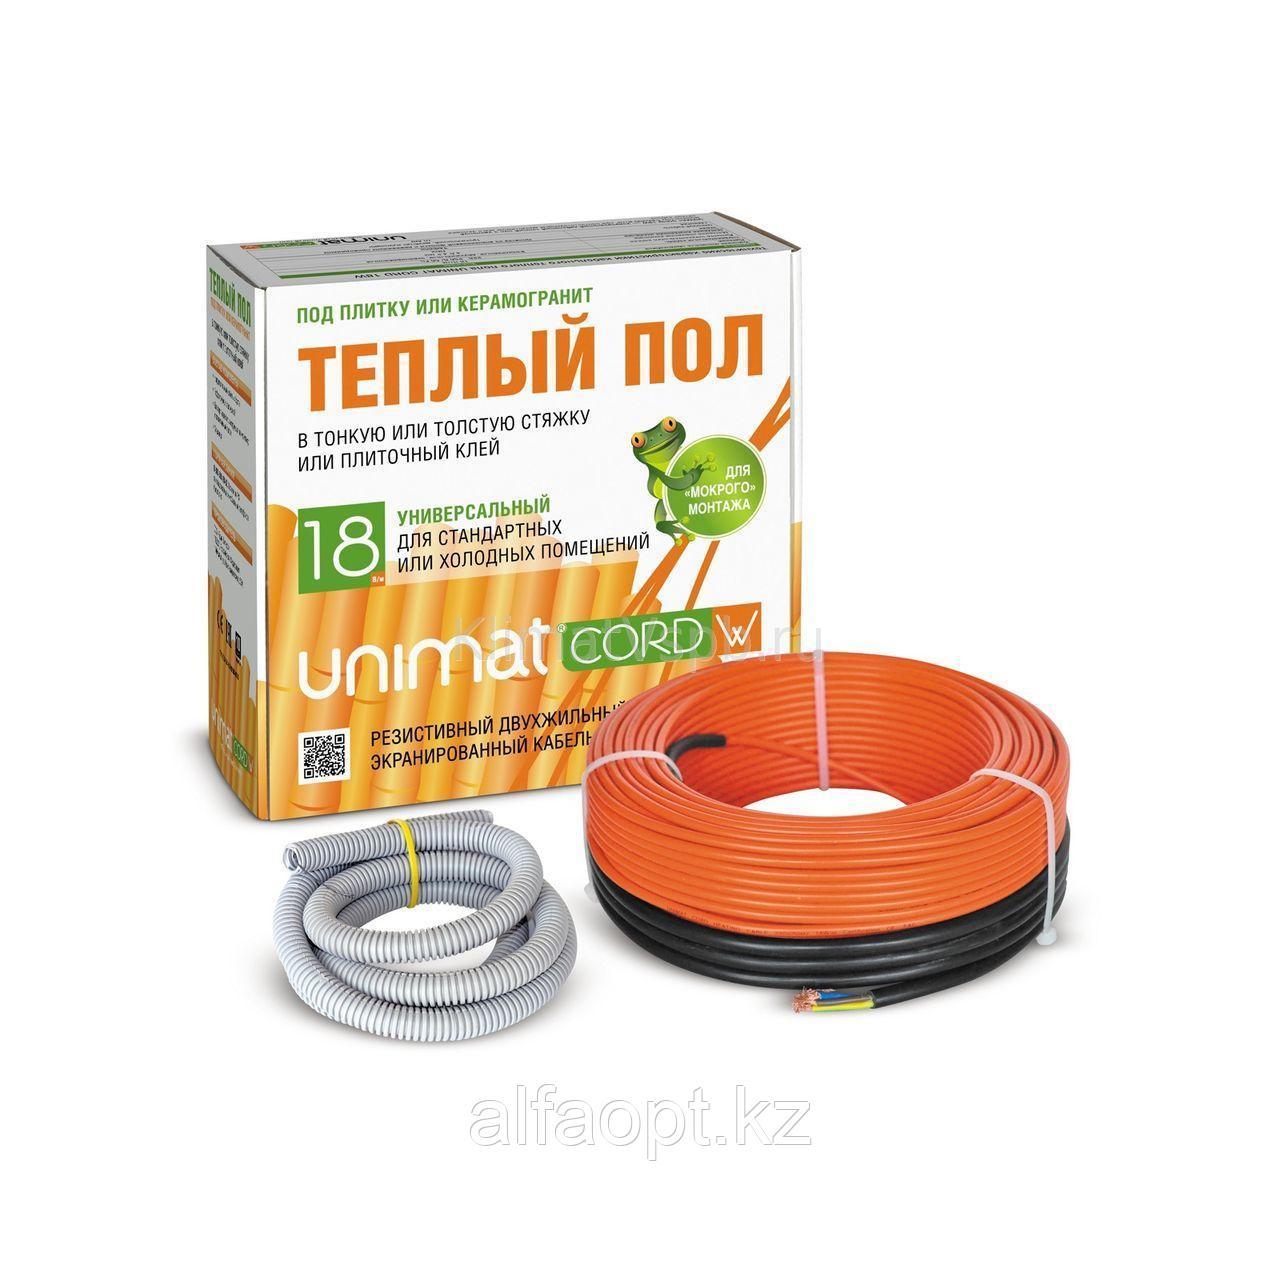 Комплект теплого пола Unimat CORD 18W-40